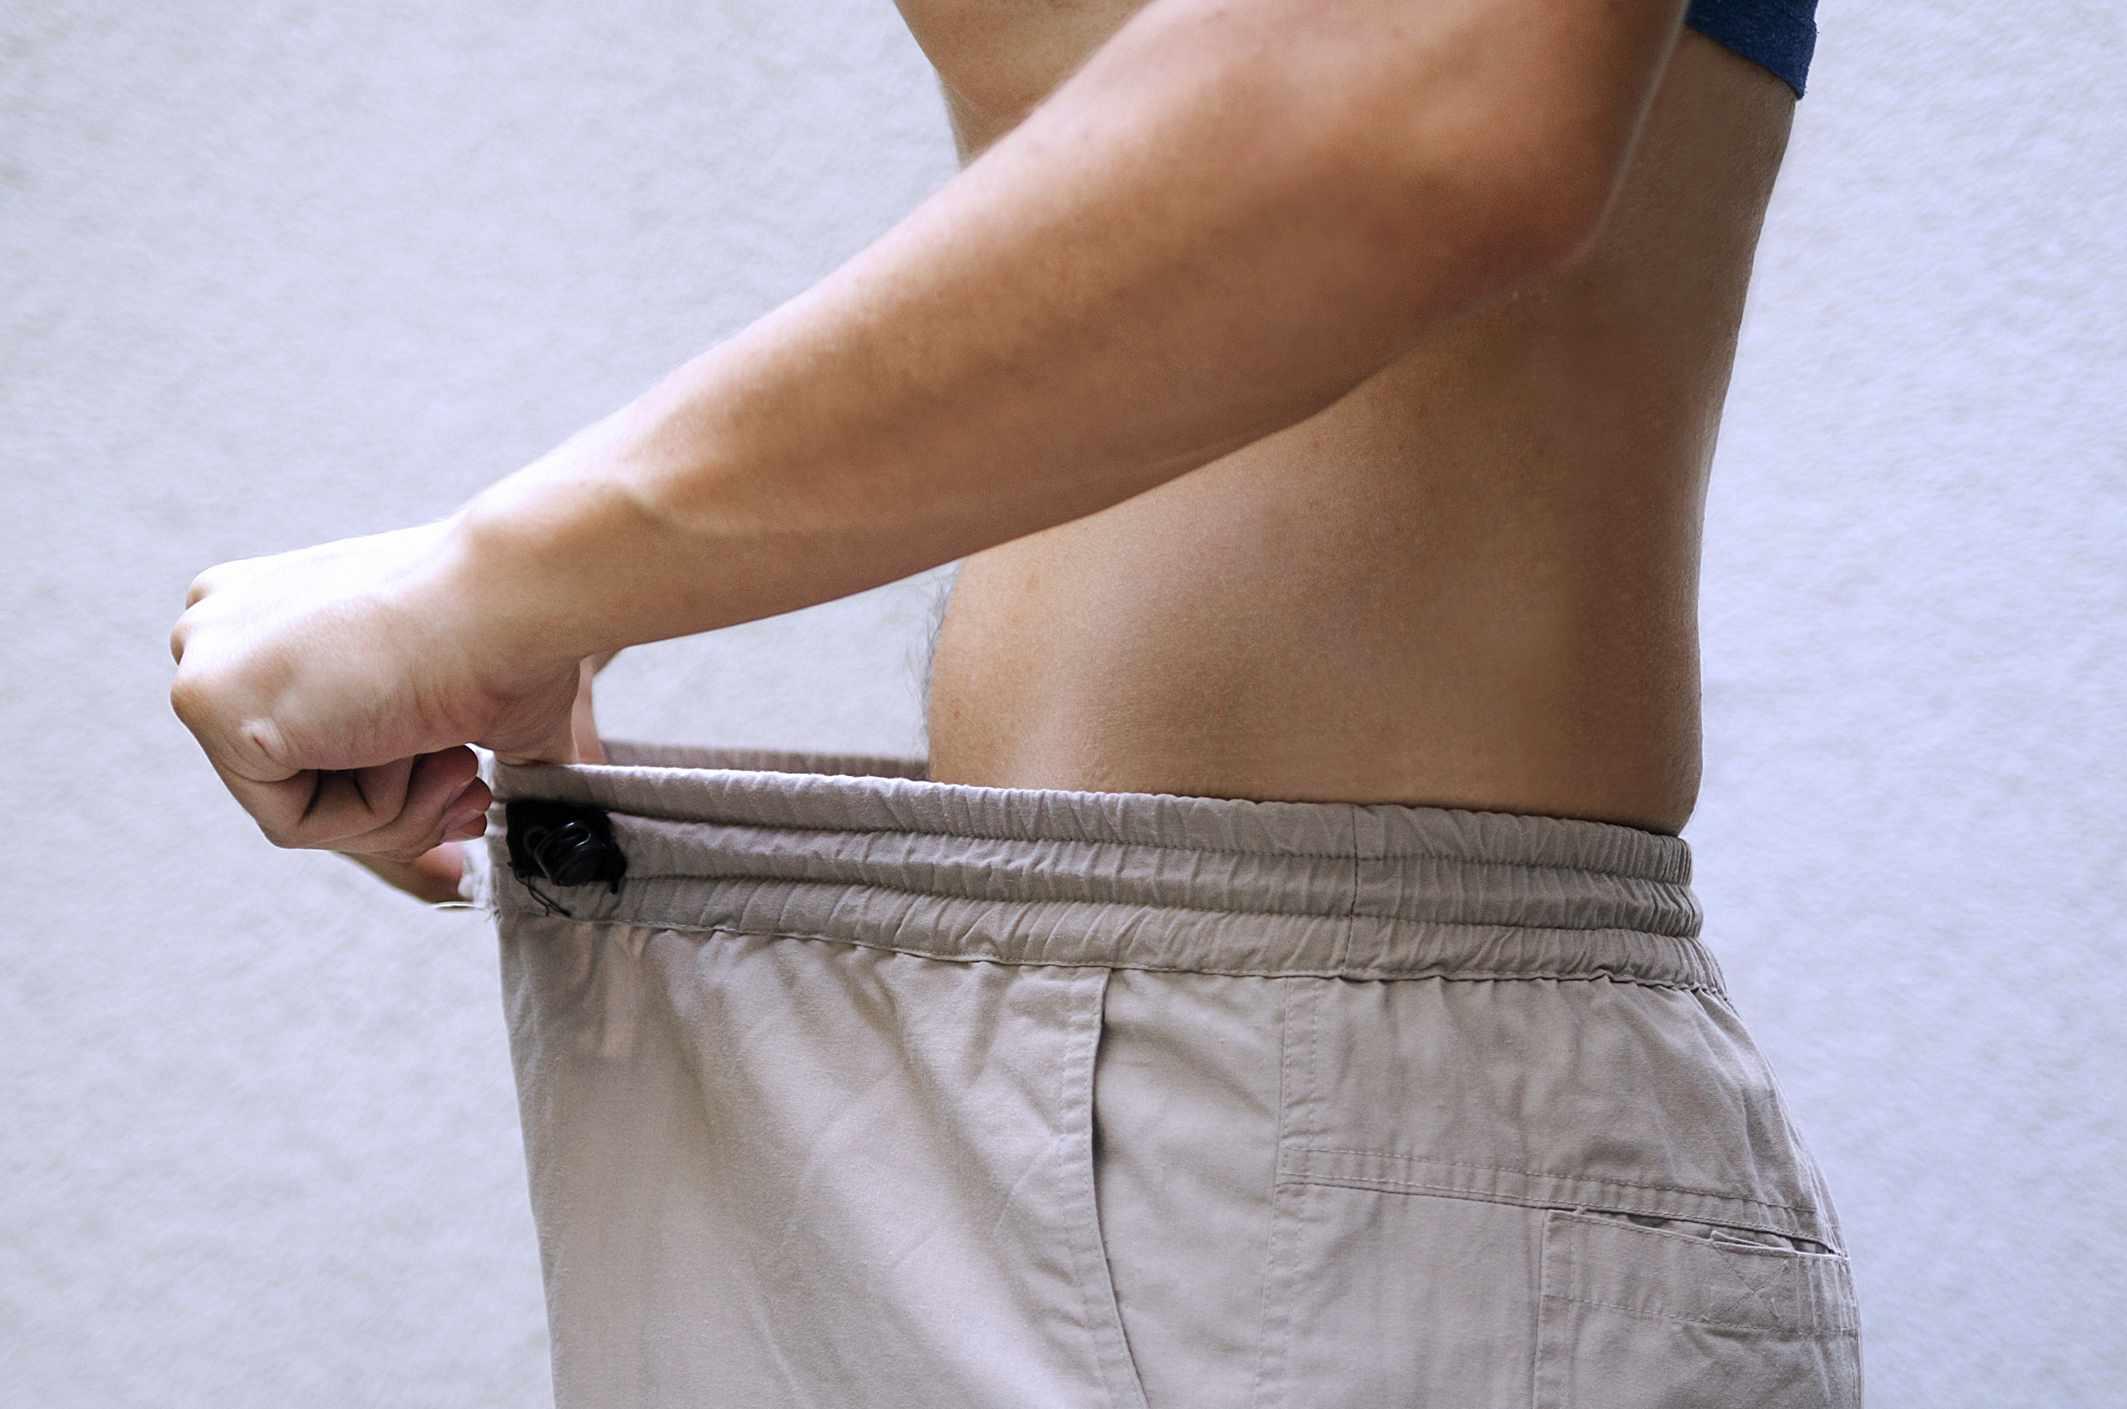 Man investigating down his pants